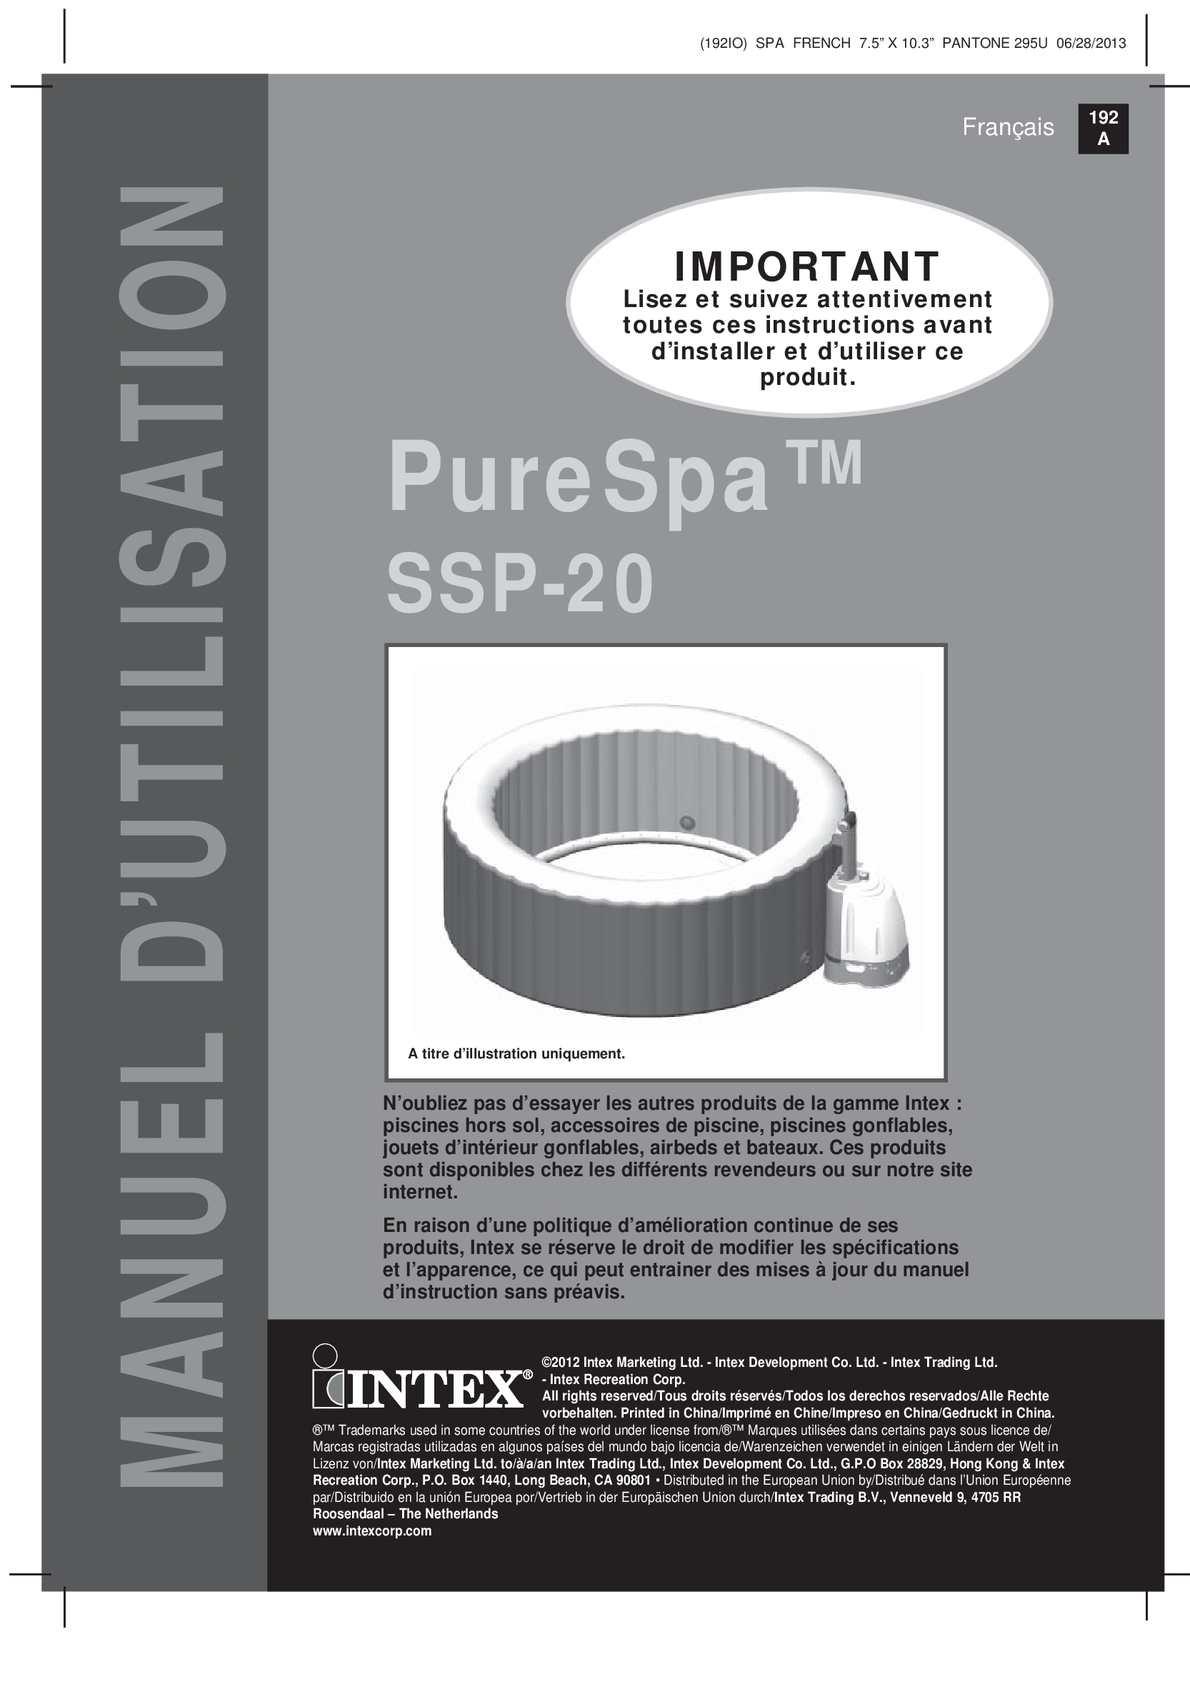 Spa Intex Qui Se Degonfle calaméo - notice de montage du spa intex purespa bulles